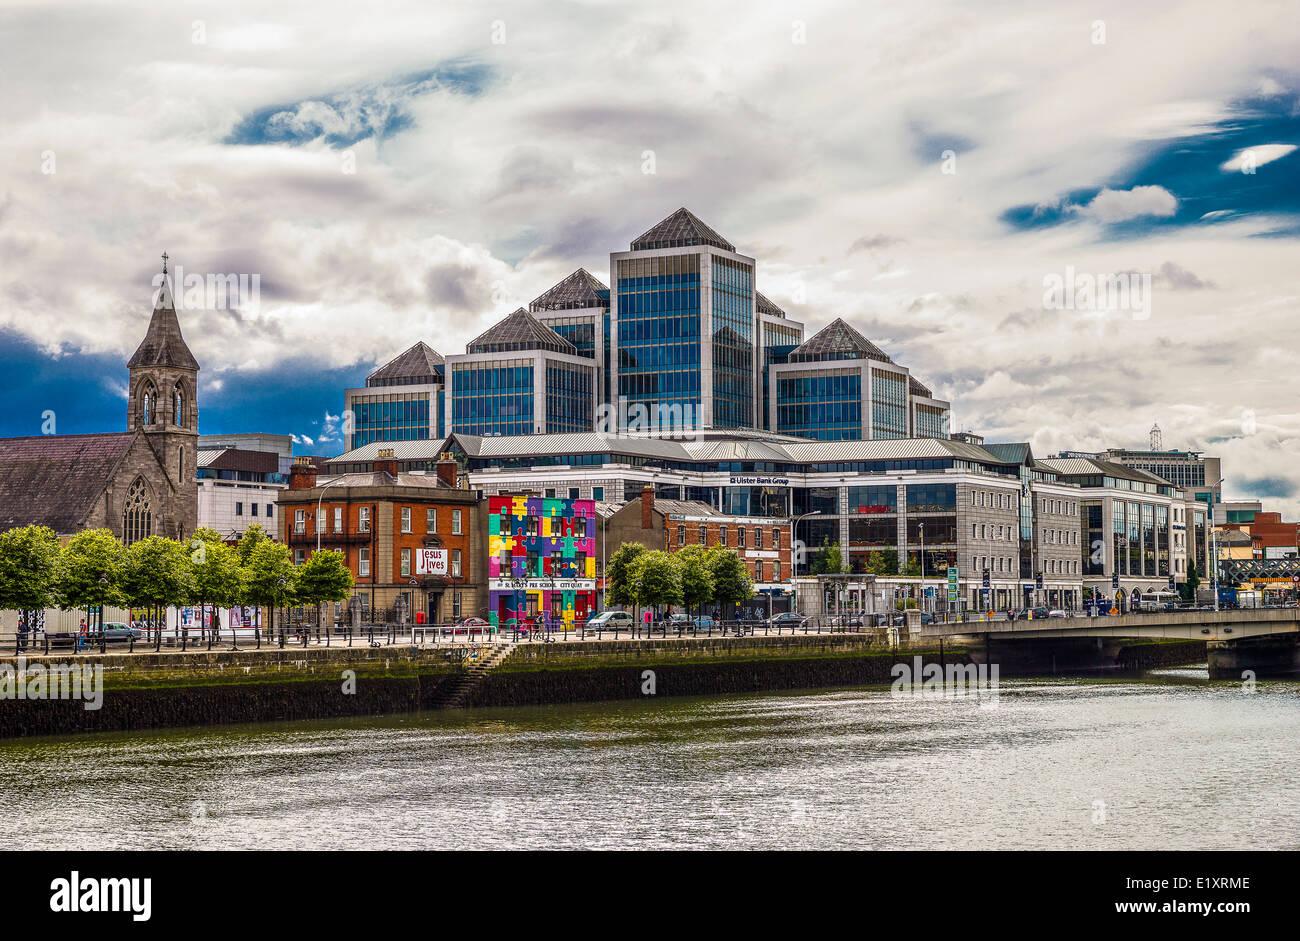 Ireland, Dublin, Nord Wall quay, view of the Finanacial Center palaces - Stock Image